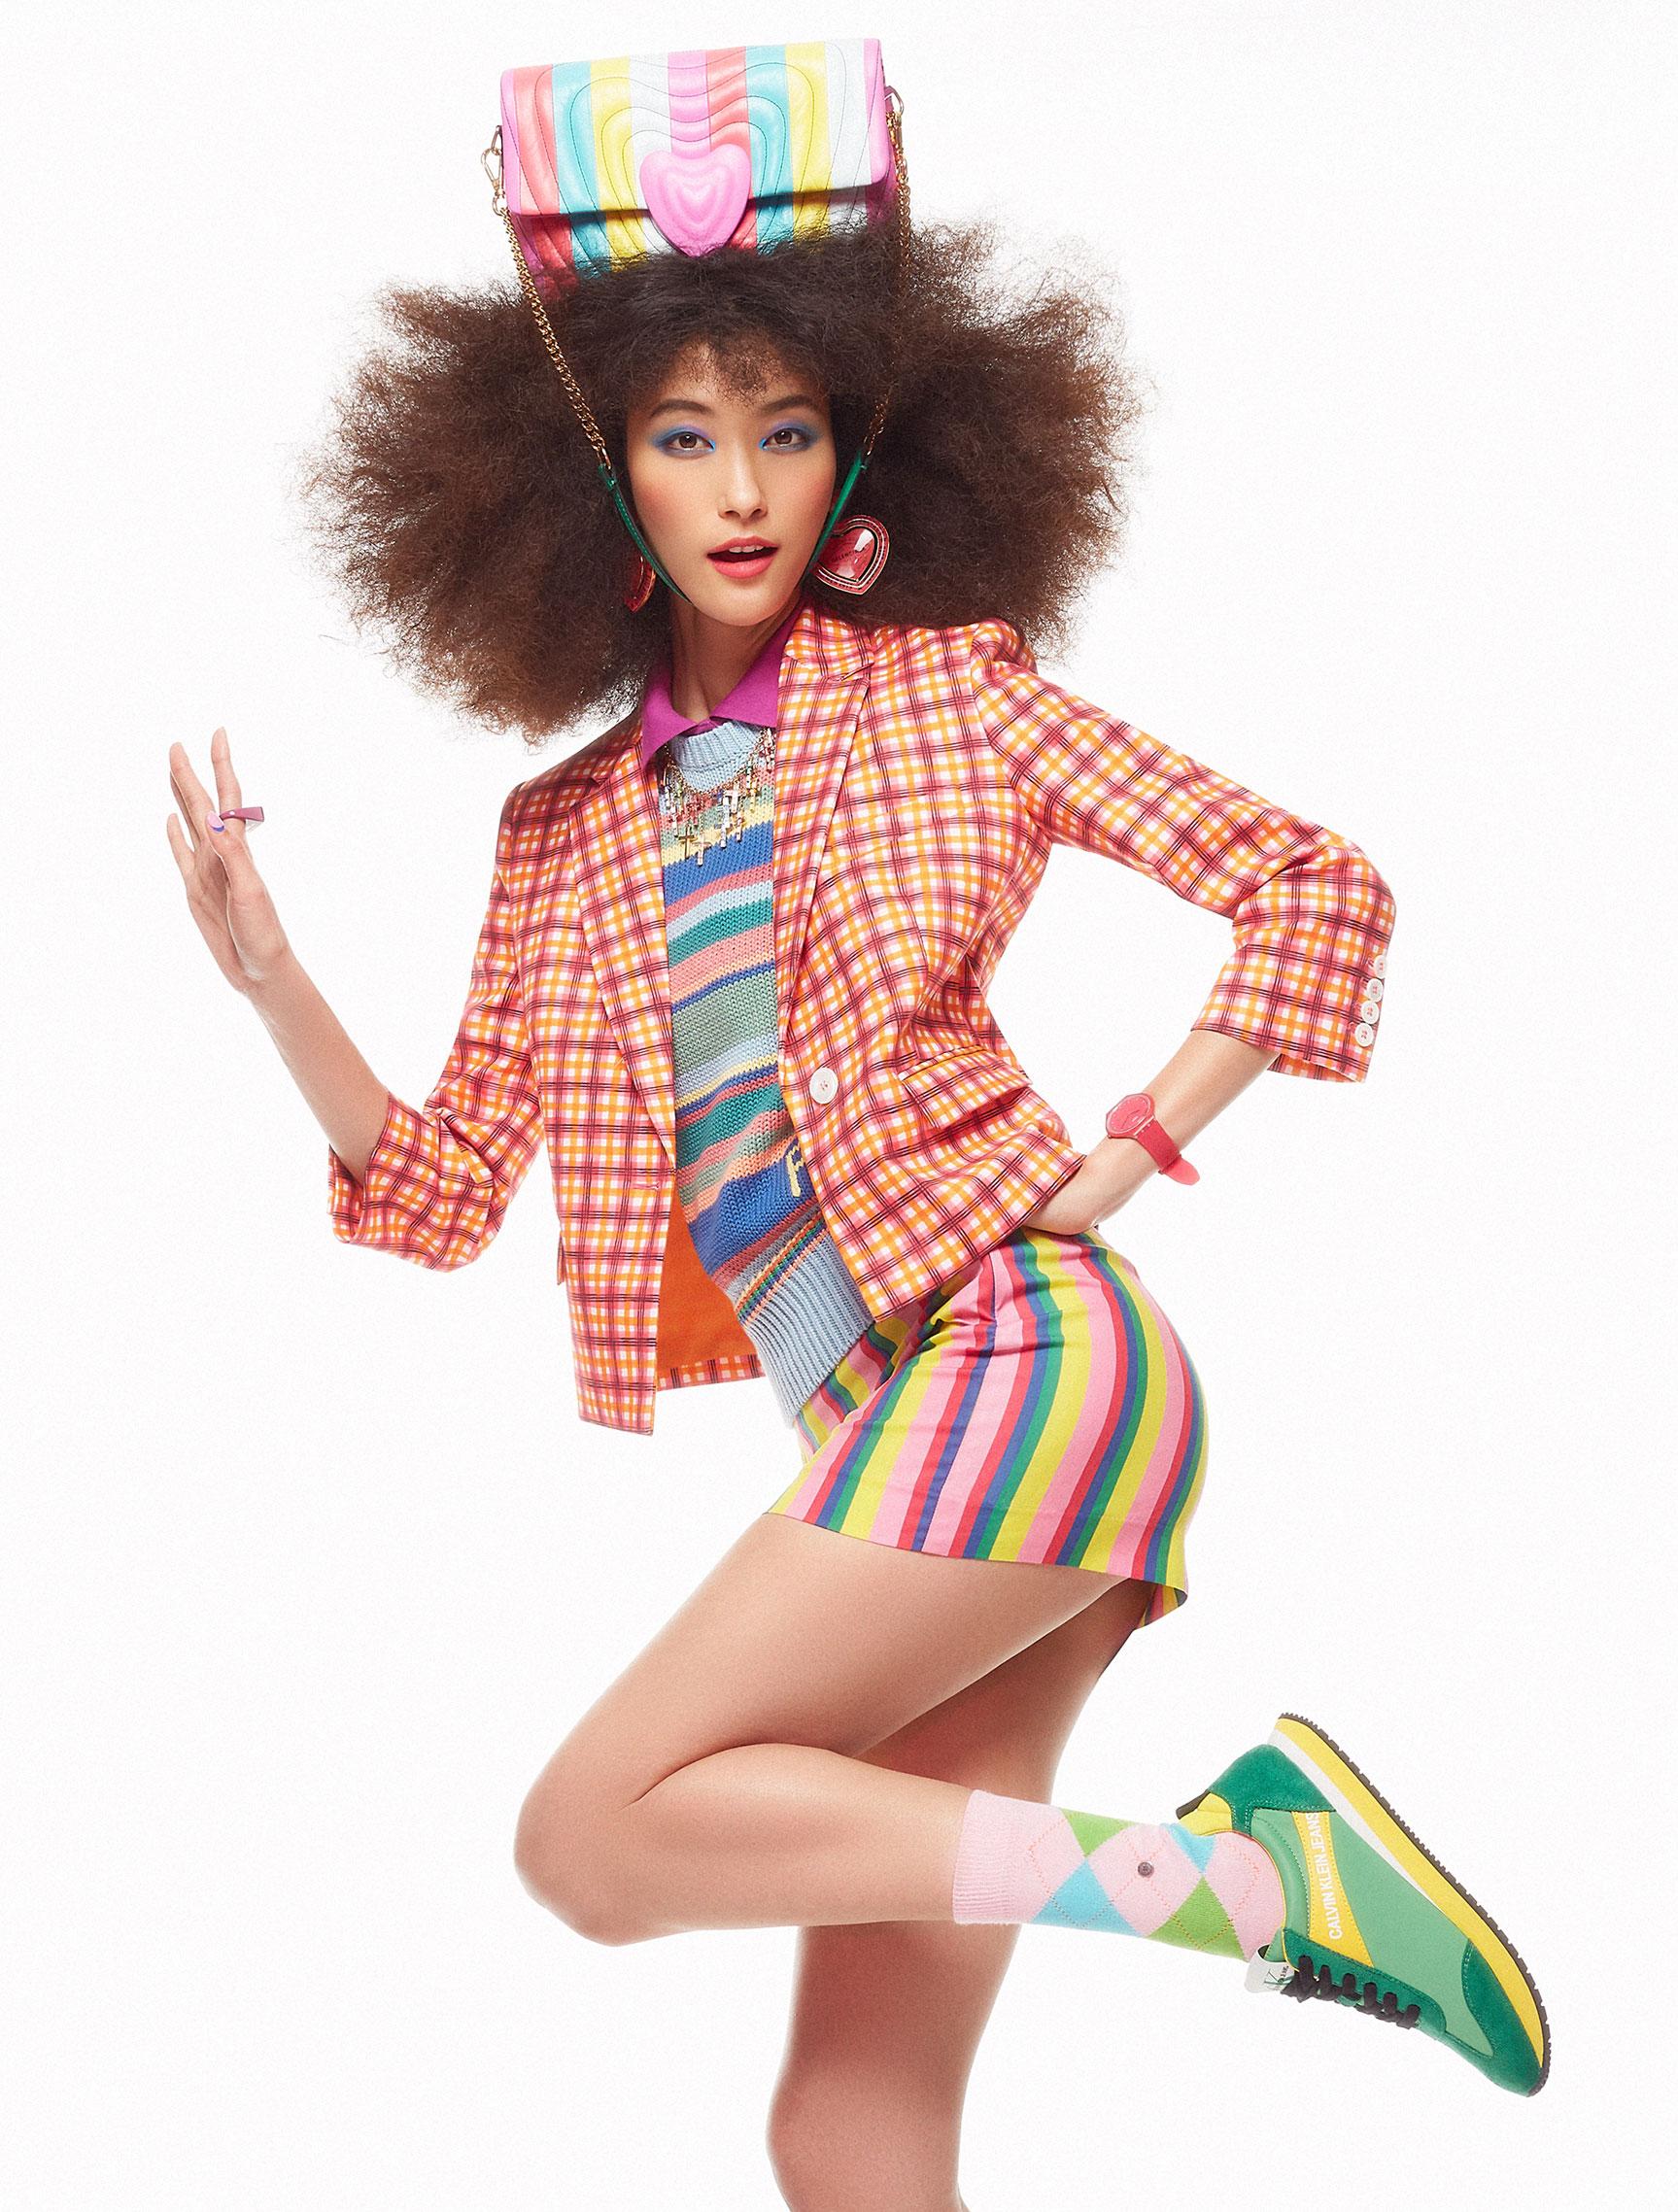 Pop Culture / Yeva Podurian, Ji Hye Park, Bhumika Arora by Daniel Clavero / Elle UK march 2019